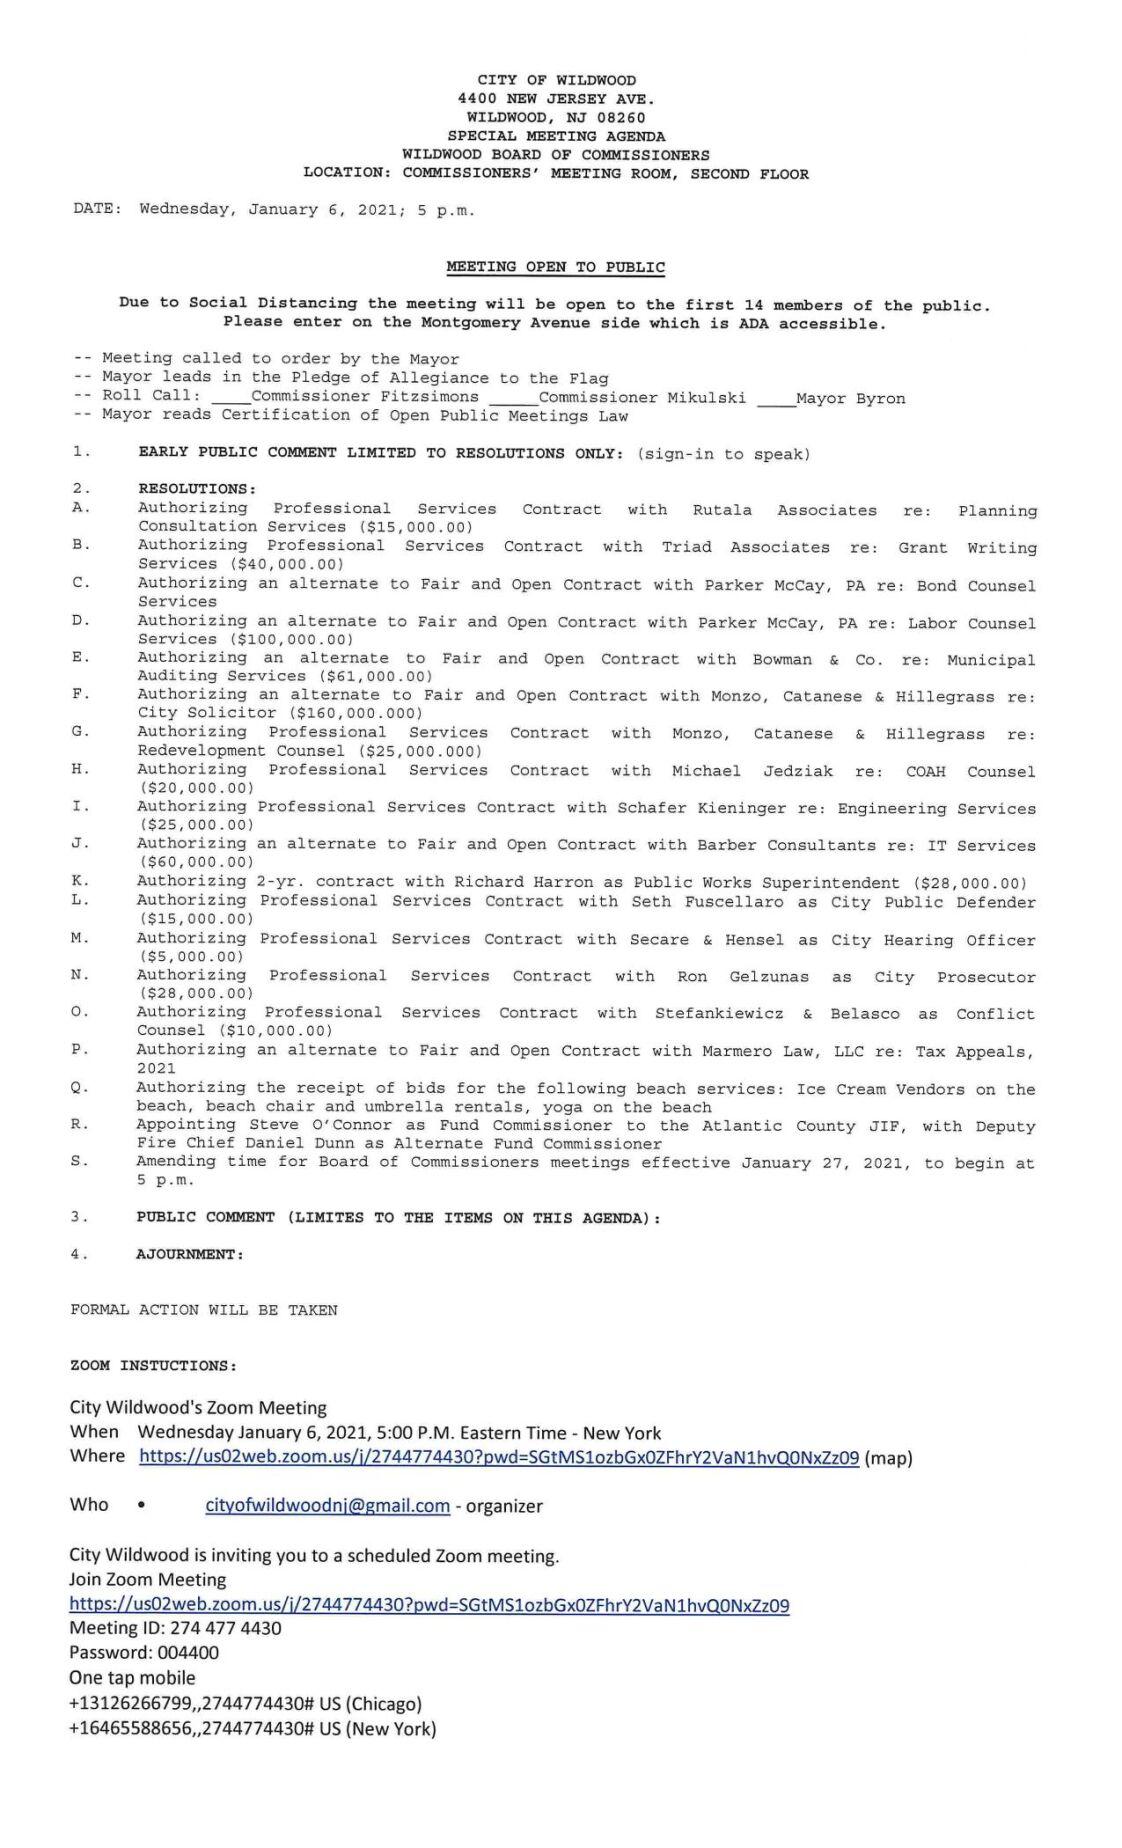 Wildwood City Commissioners Meeting Agenda Jan. 6, 2021